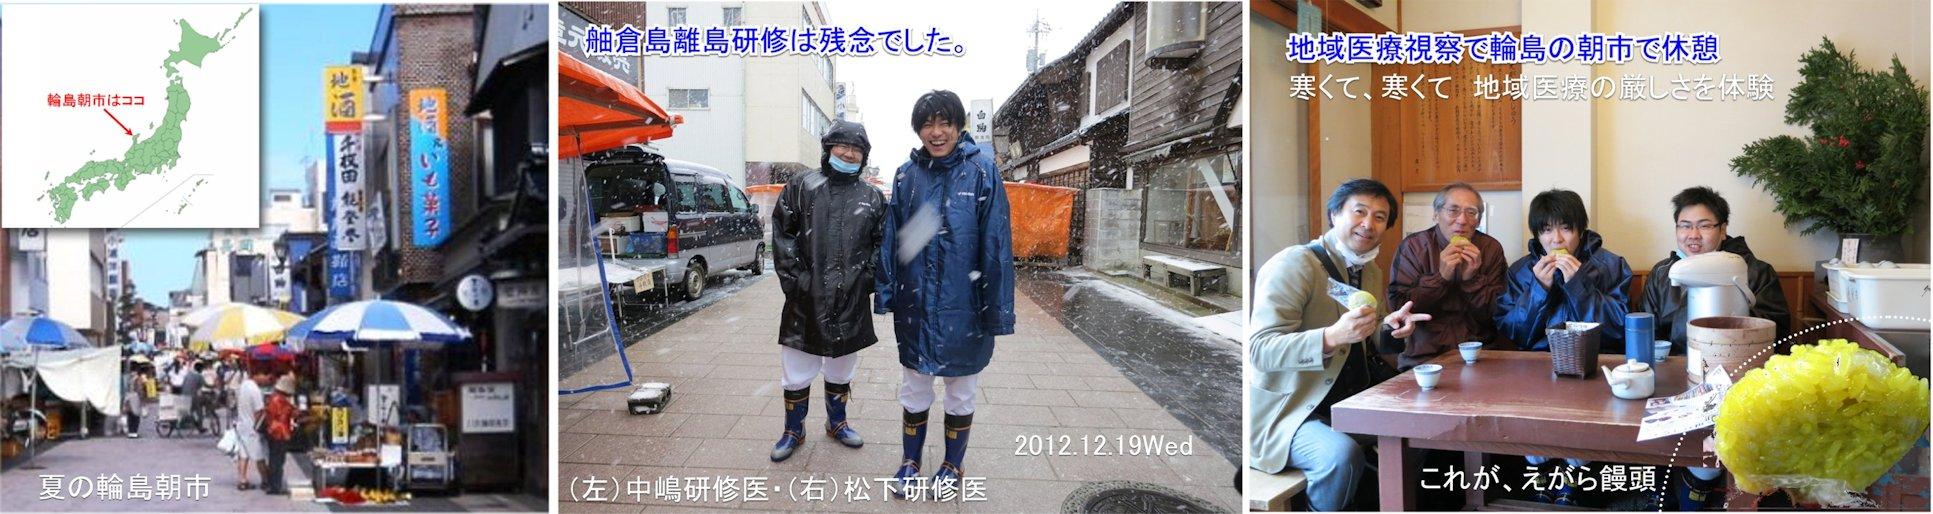 wajima20121219.jpg